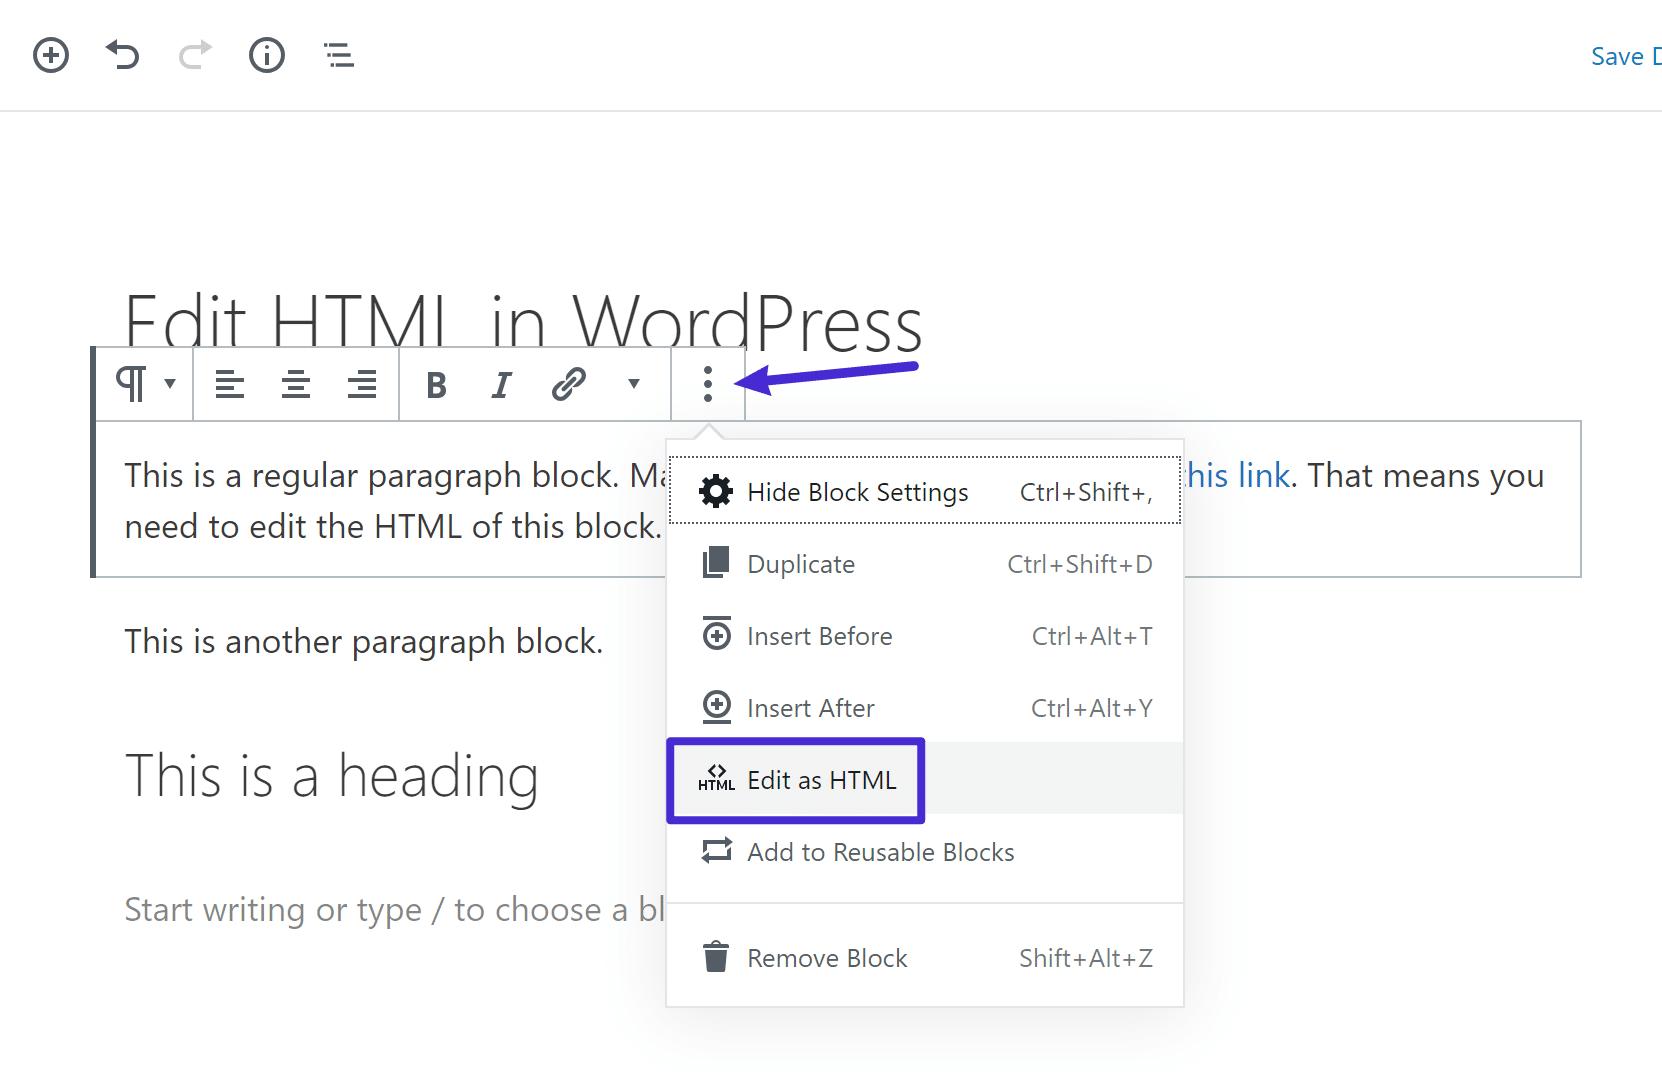 Sådan redigeres en enkelt blok som HTML